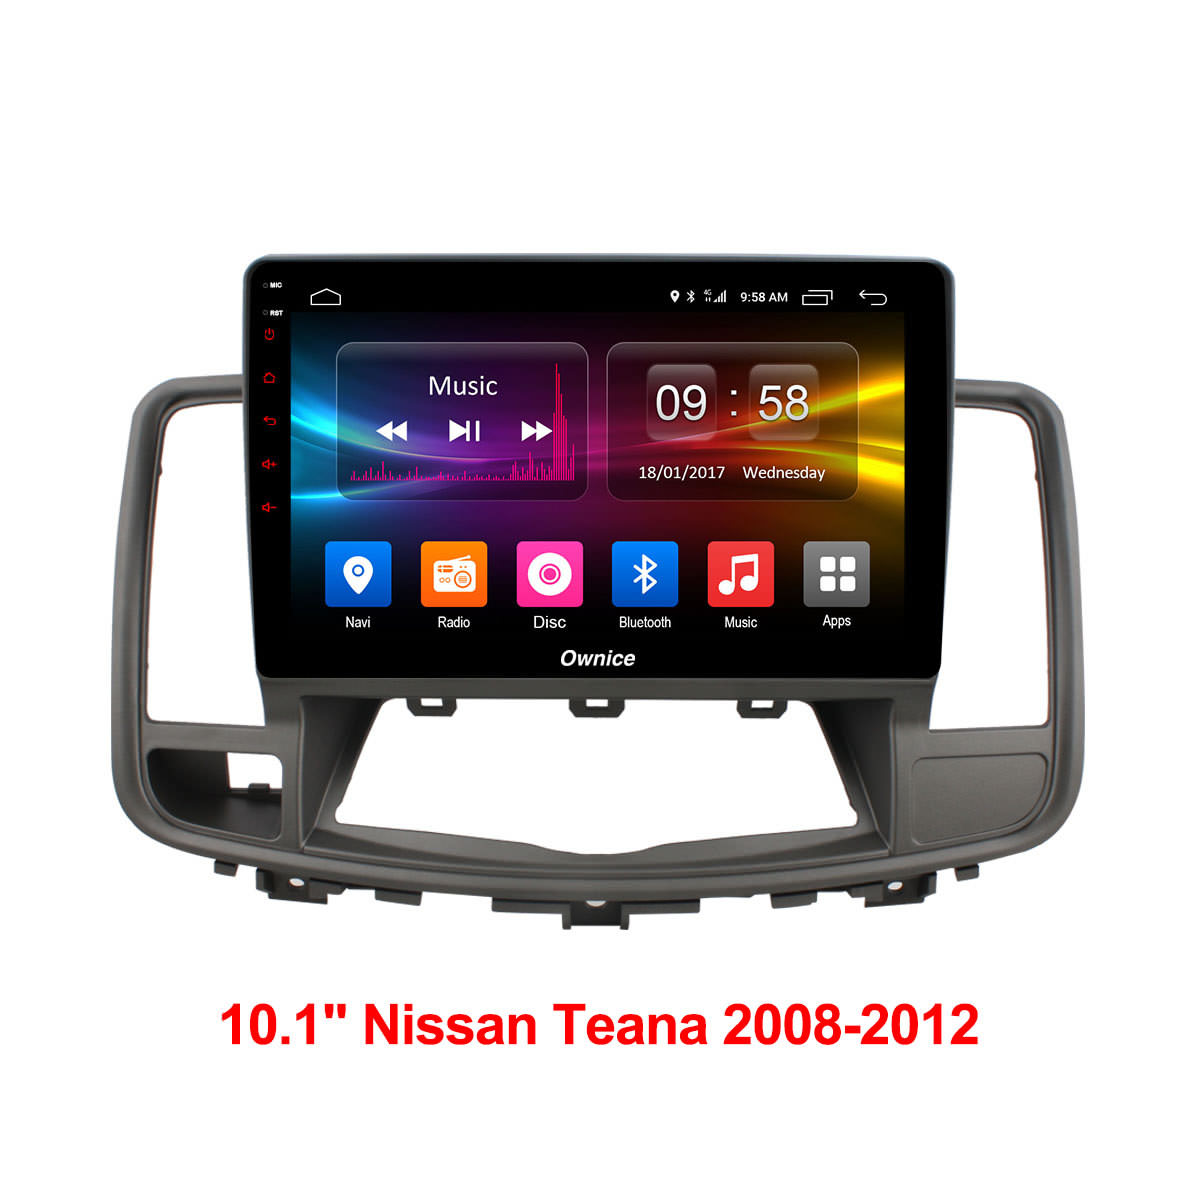 Штатная магнитола CARMEDIA OL-1669 DVD Nissan TEANA 2008-2013 штатная магнитола carmedia ol 1642 dvd honda accord 2013 с внешним dvd